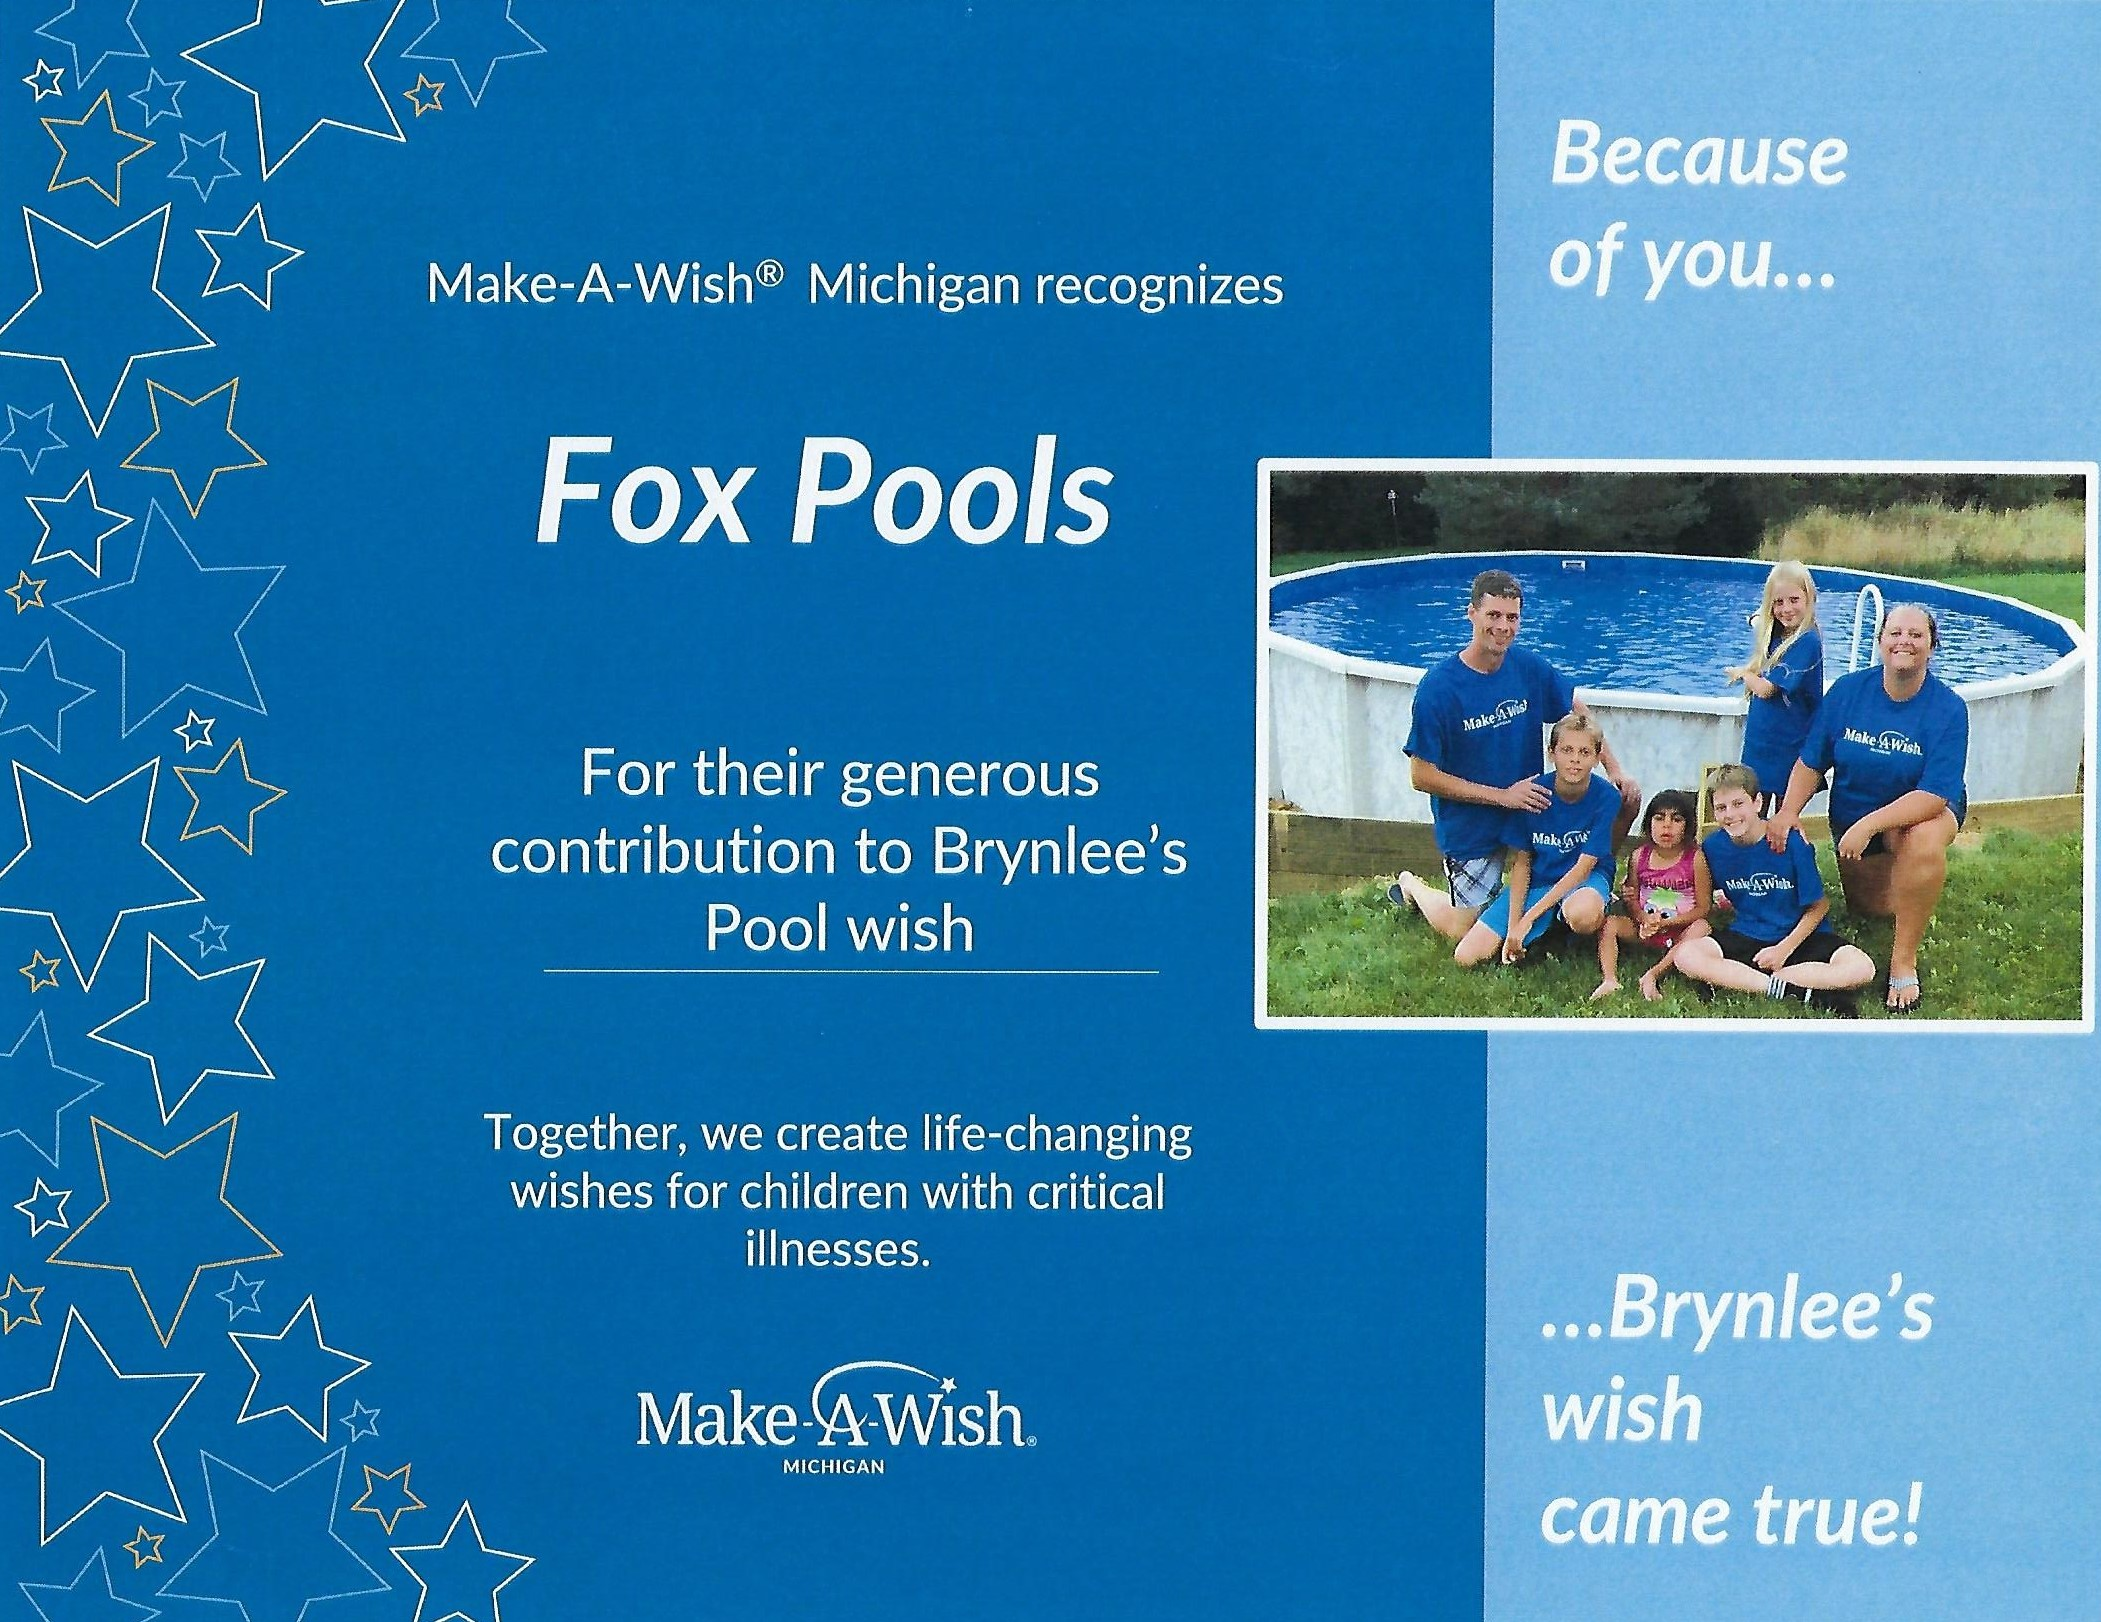 Fox Pools